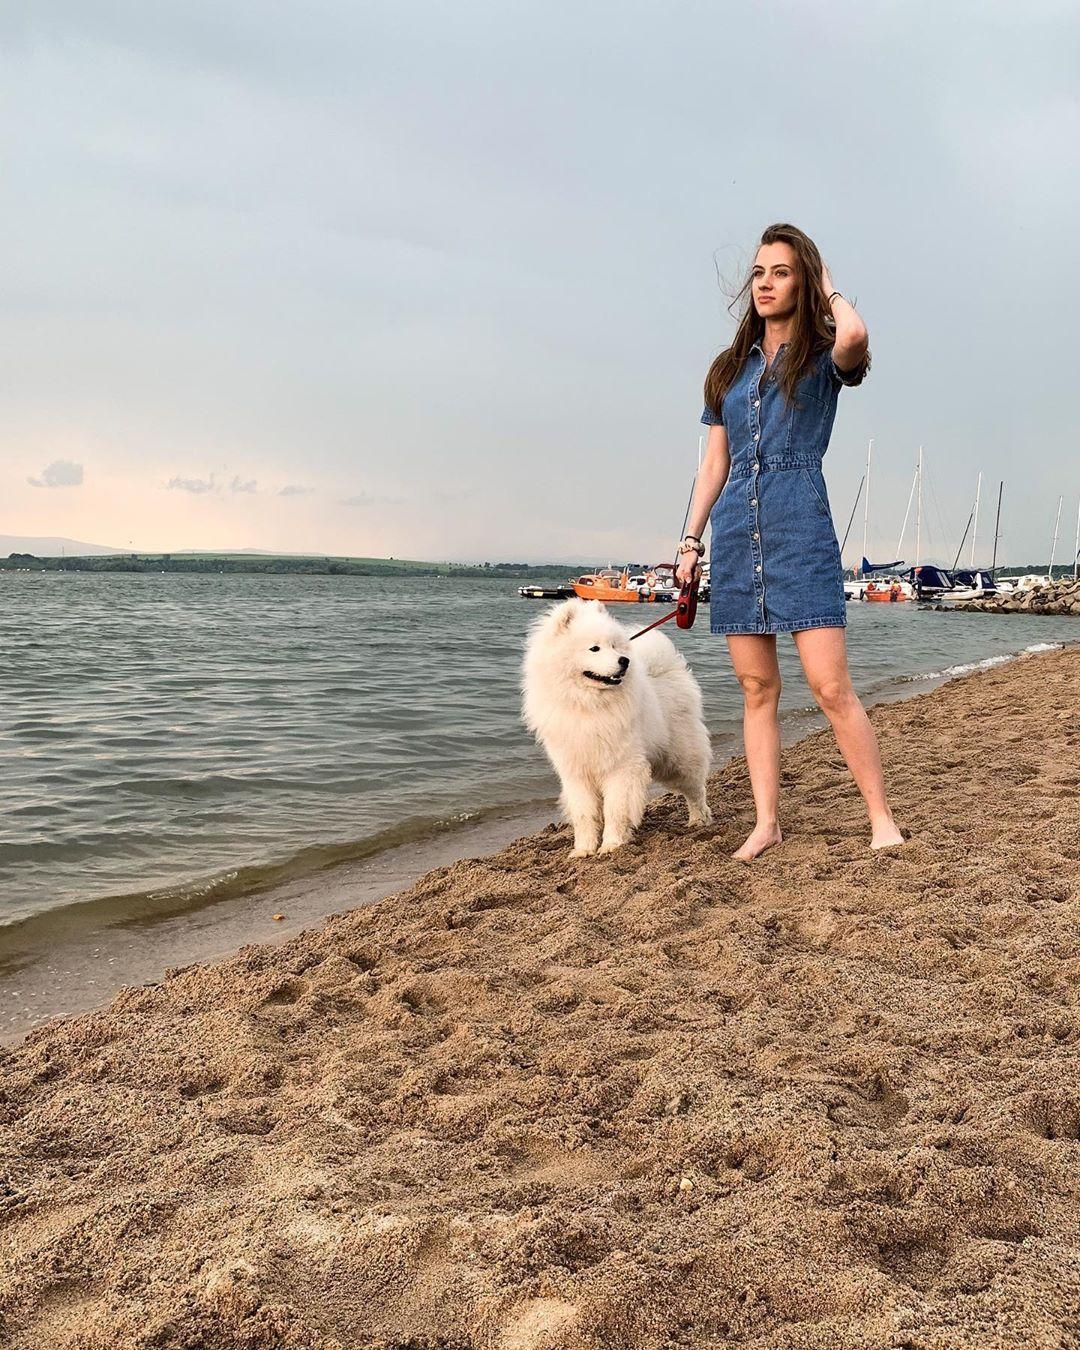 #samoyed #summer #beachvibes #l4l